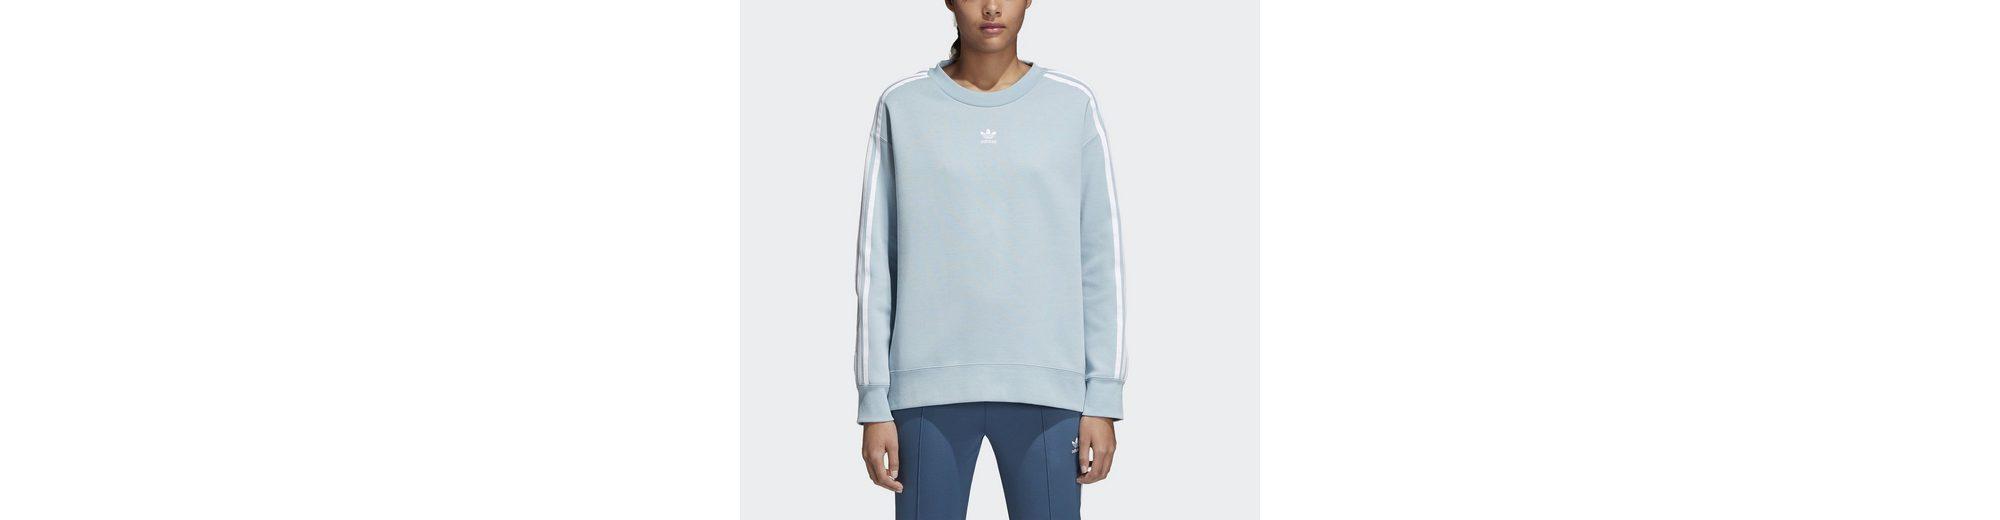 adidas Originals Longpullover Sweatshirt